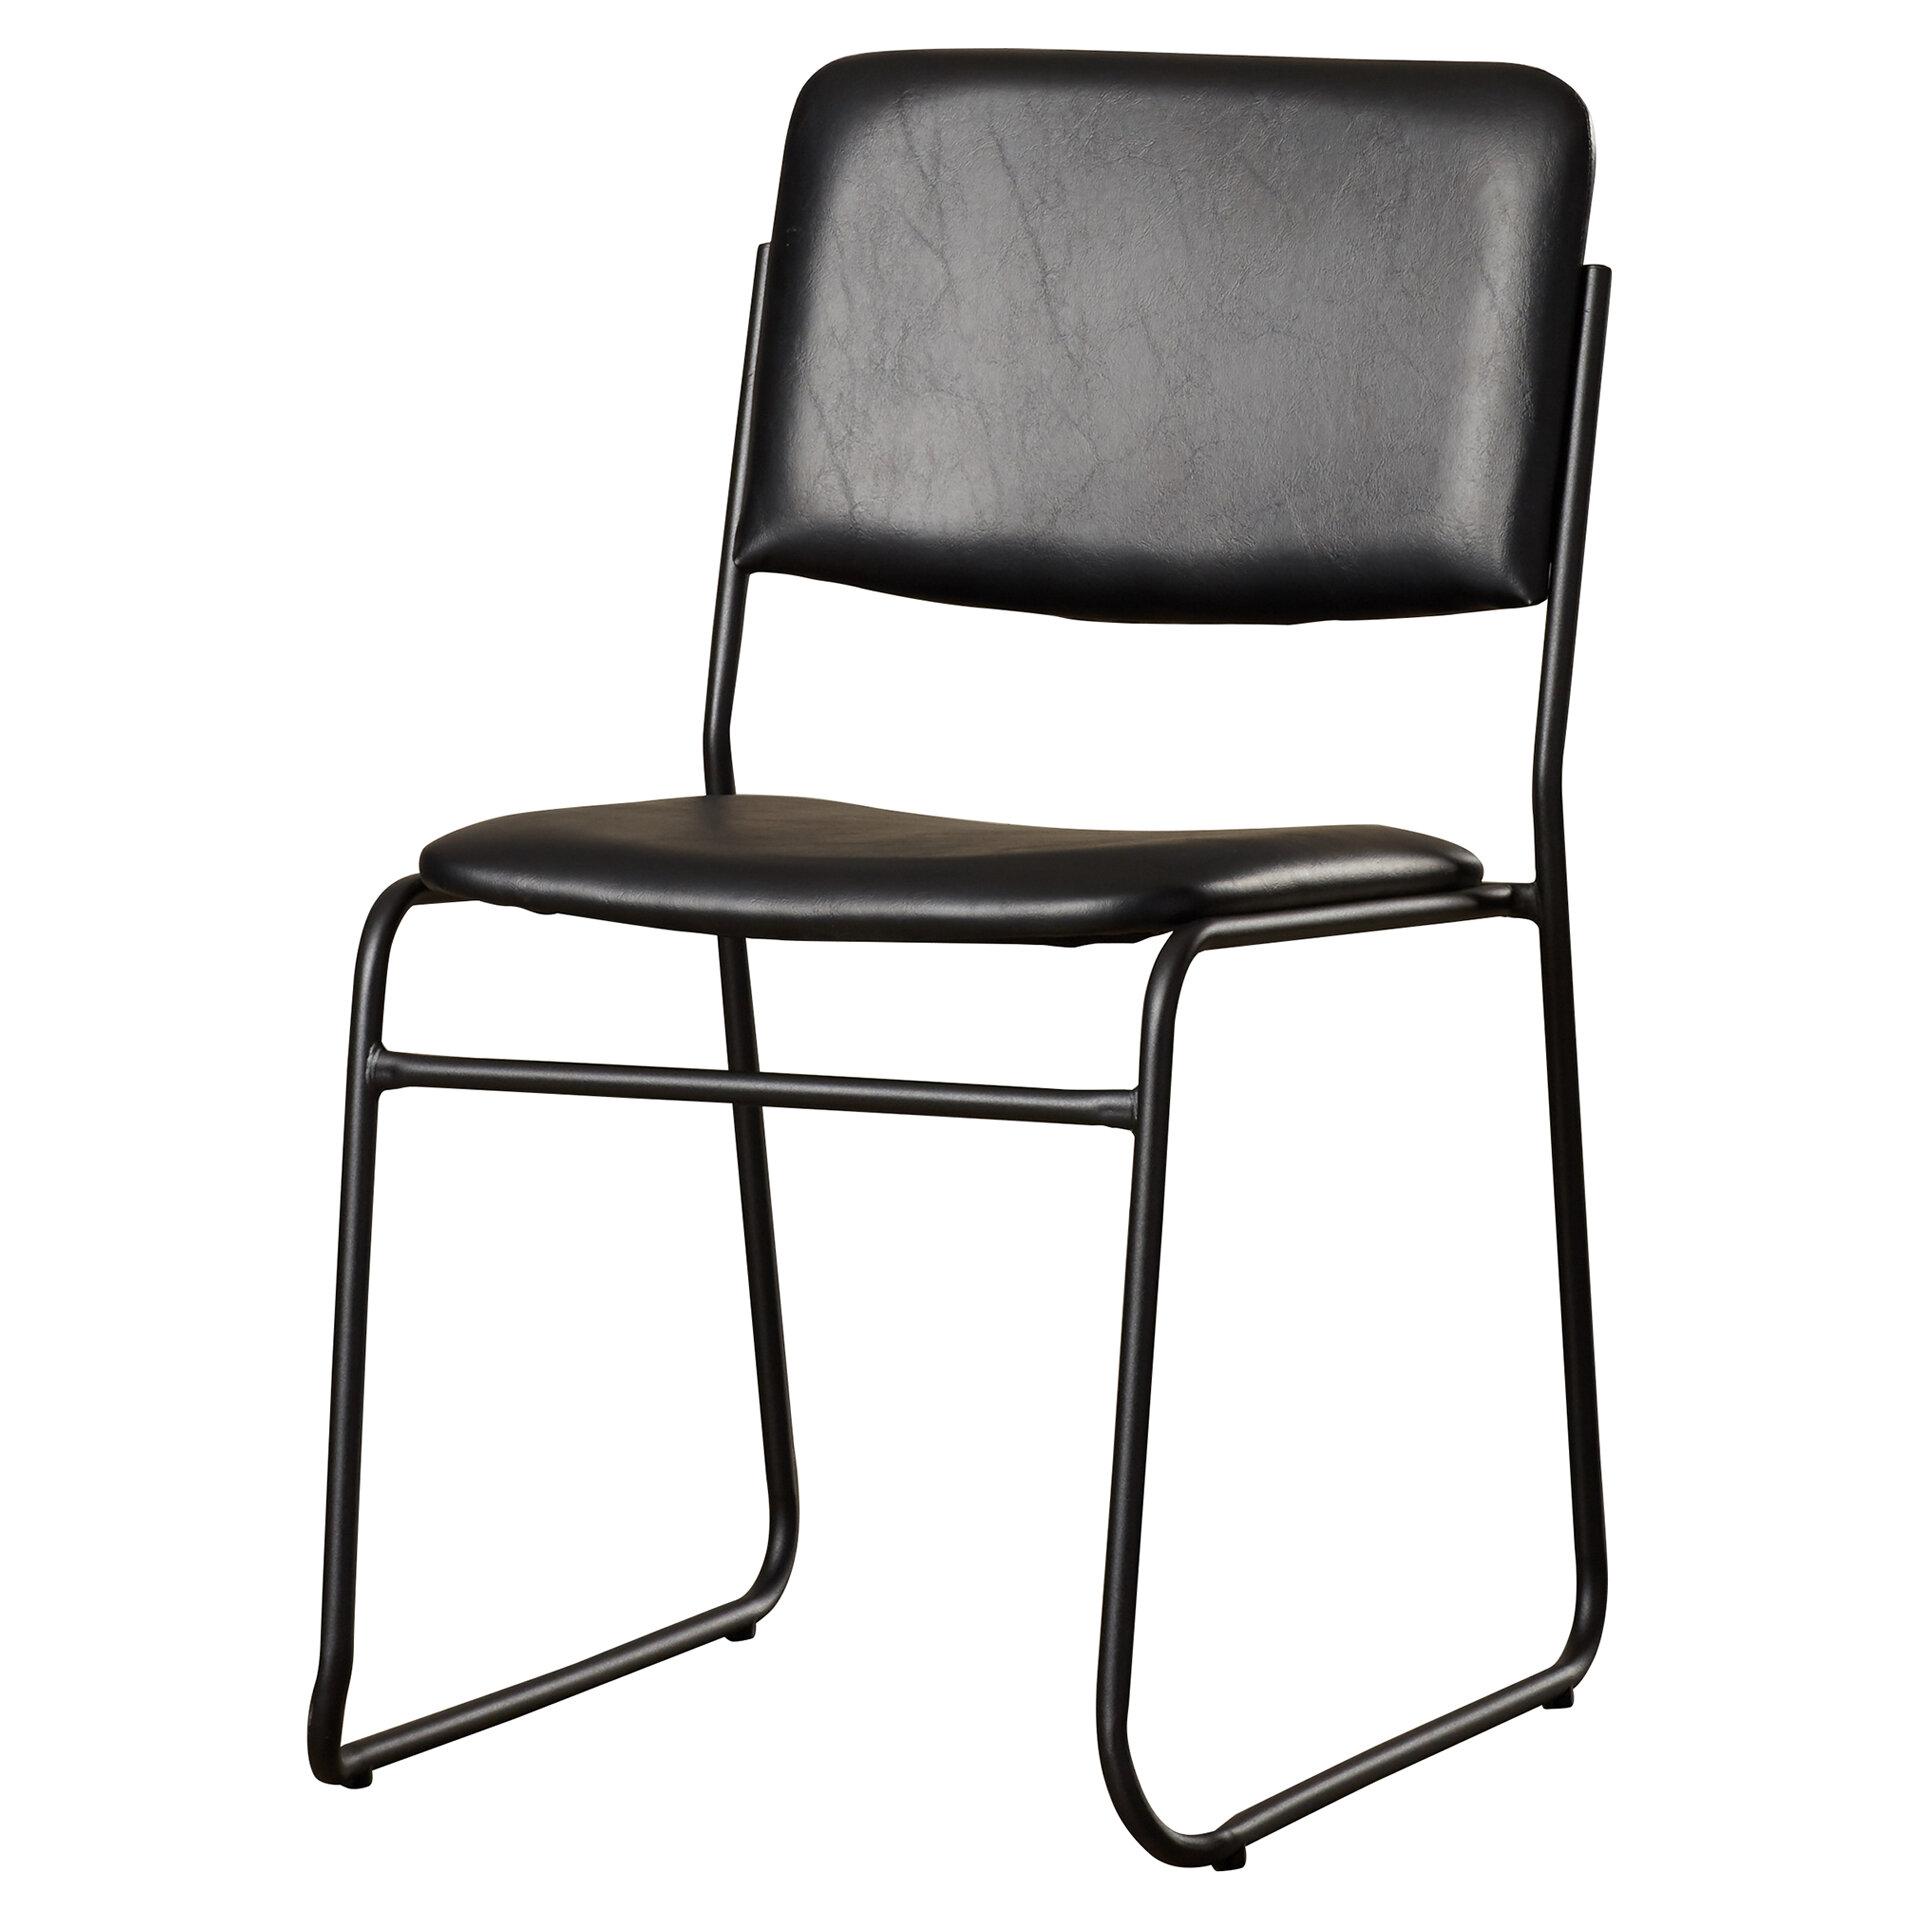 Macarthur Guest Chair With Metal Frame Reviews Allmodern